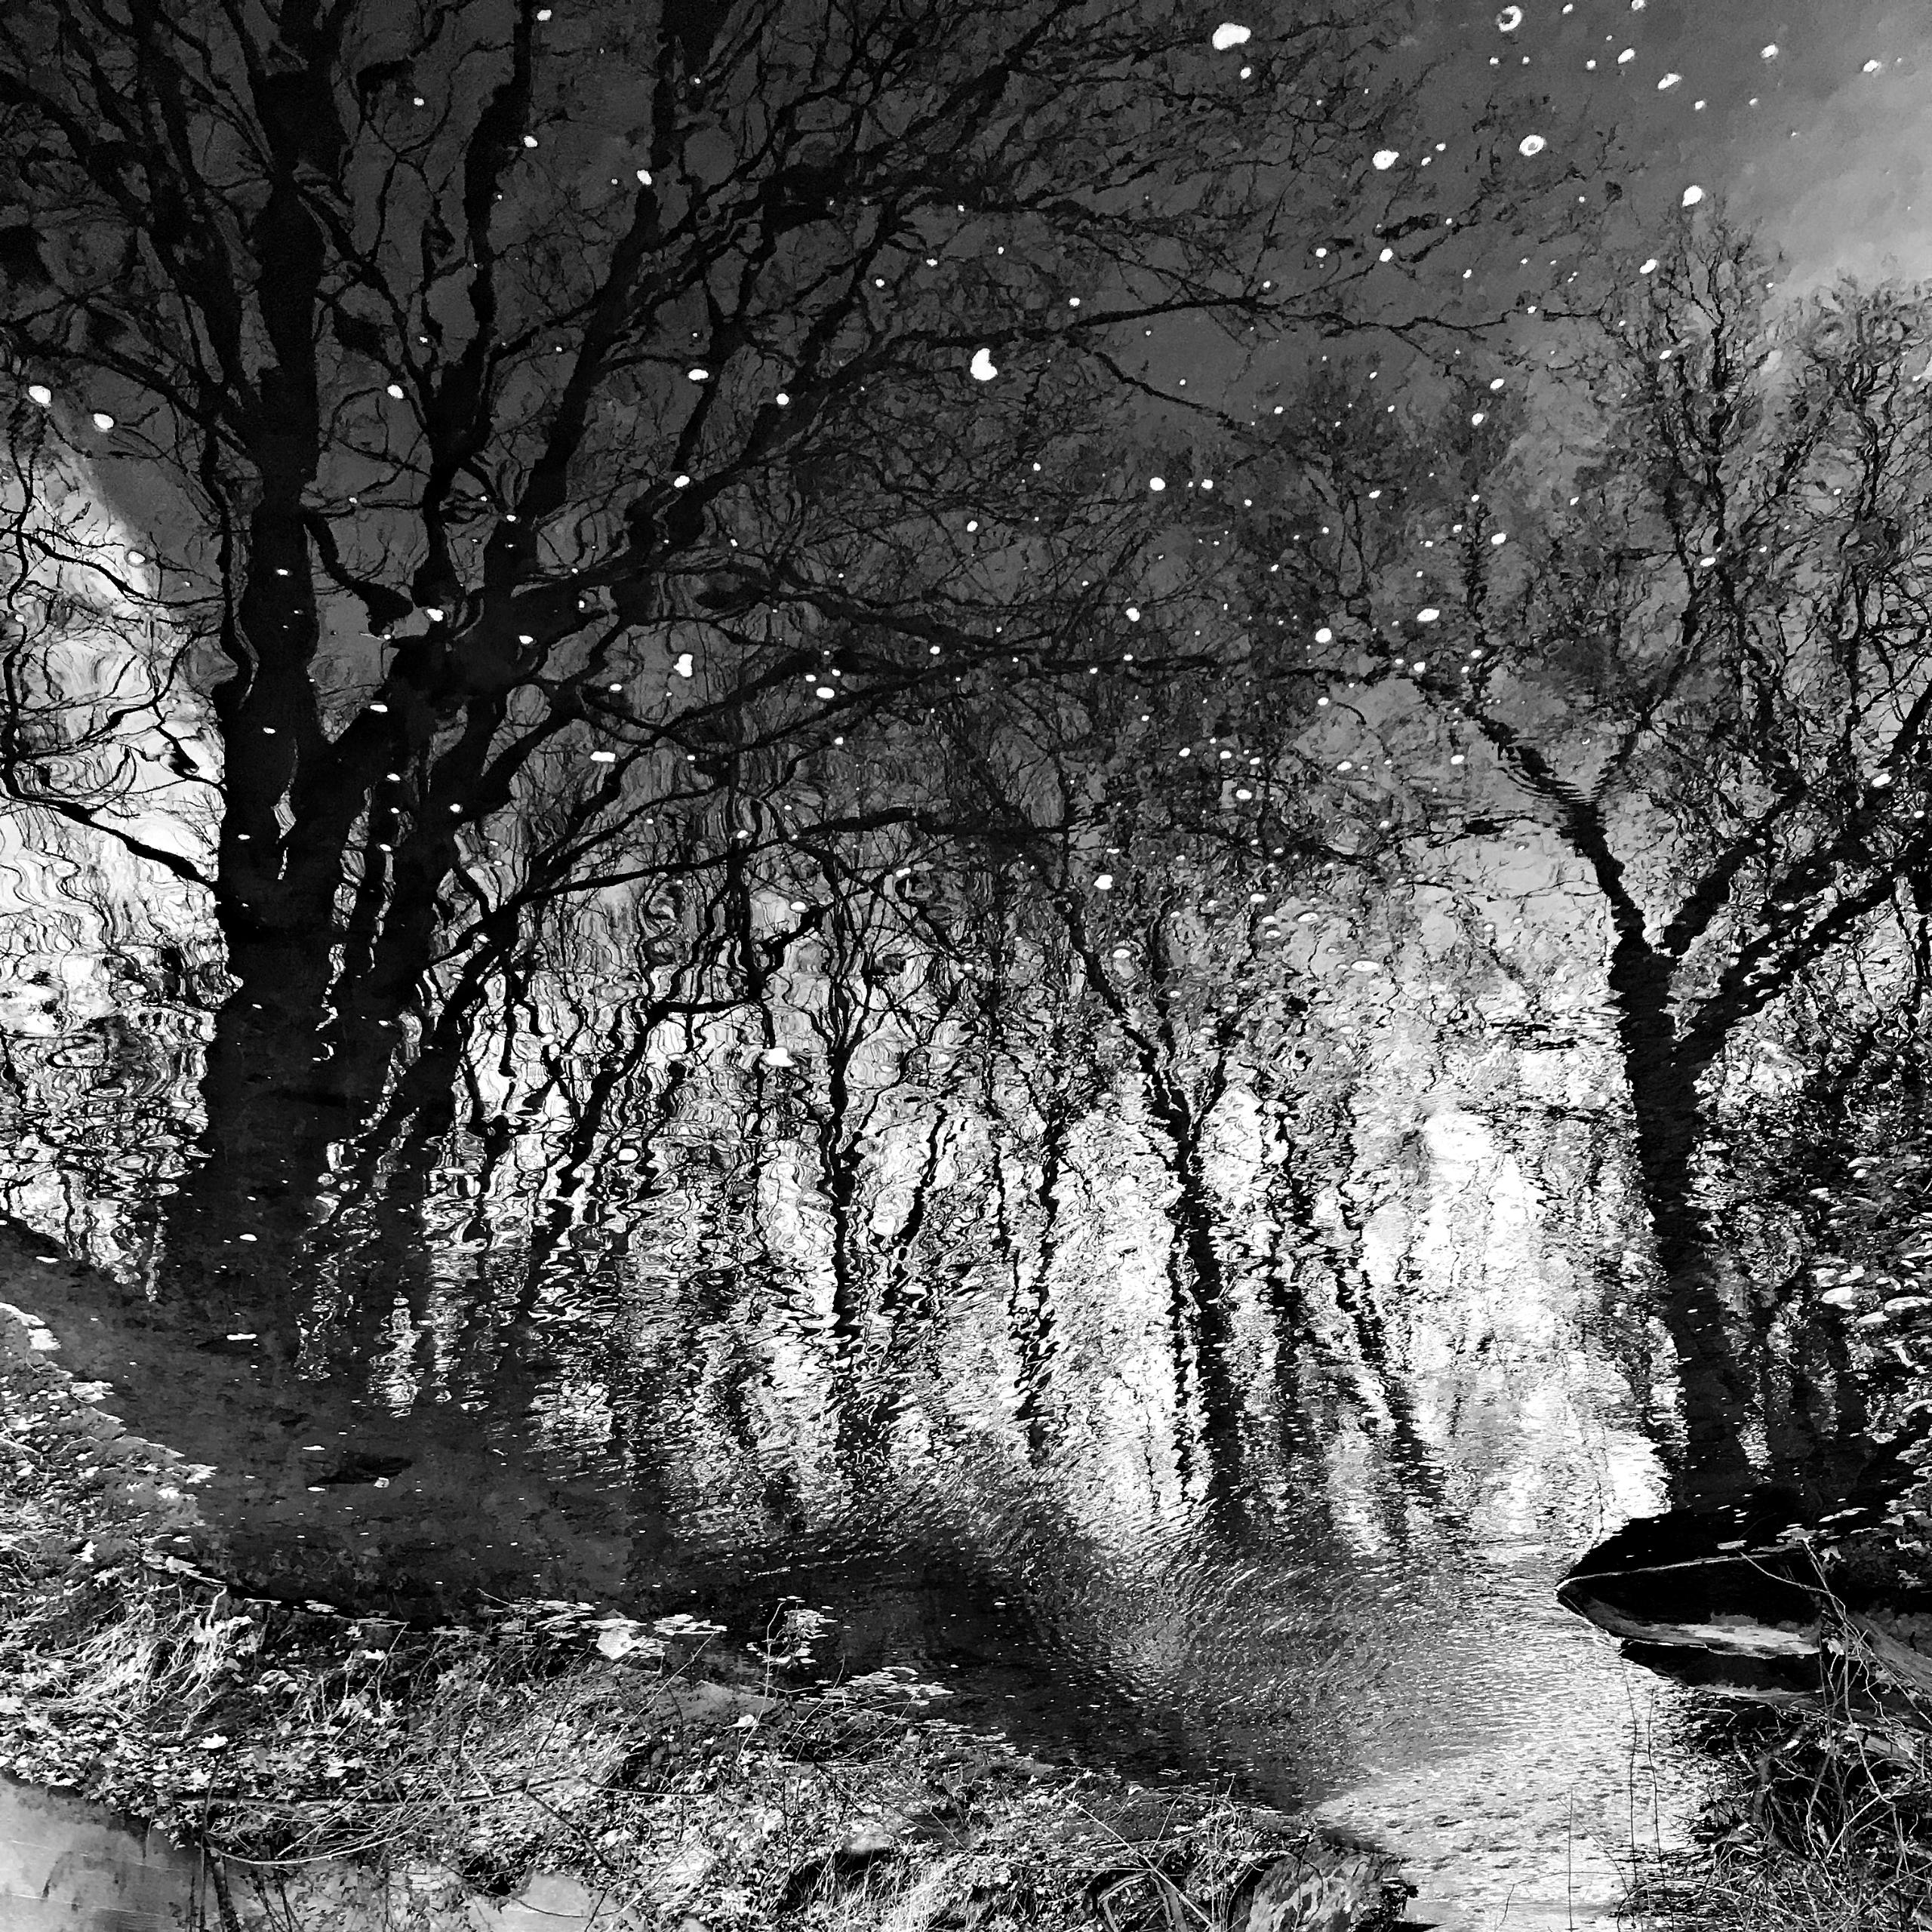 forest dark dreary - photography - kenlong   ello